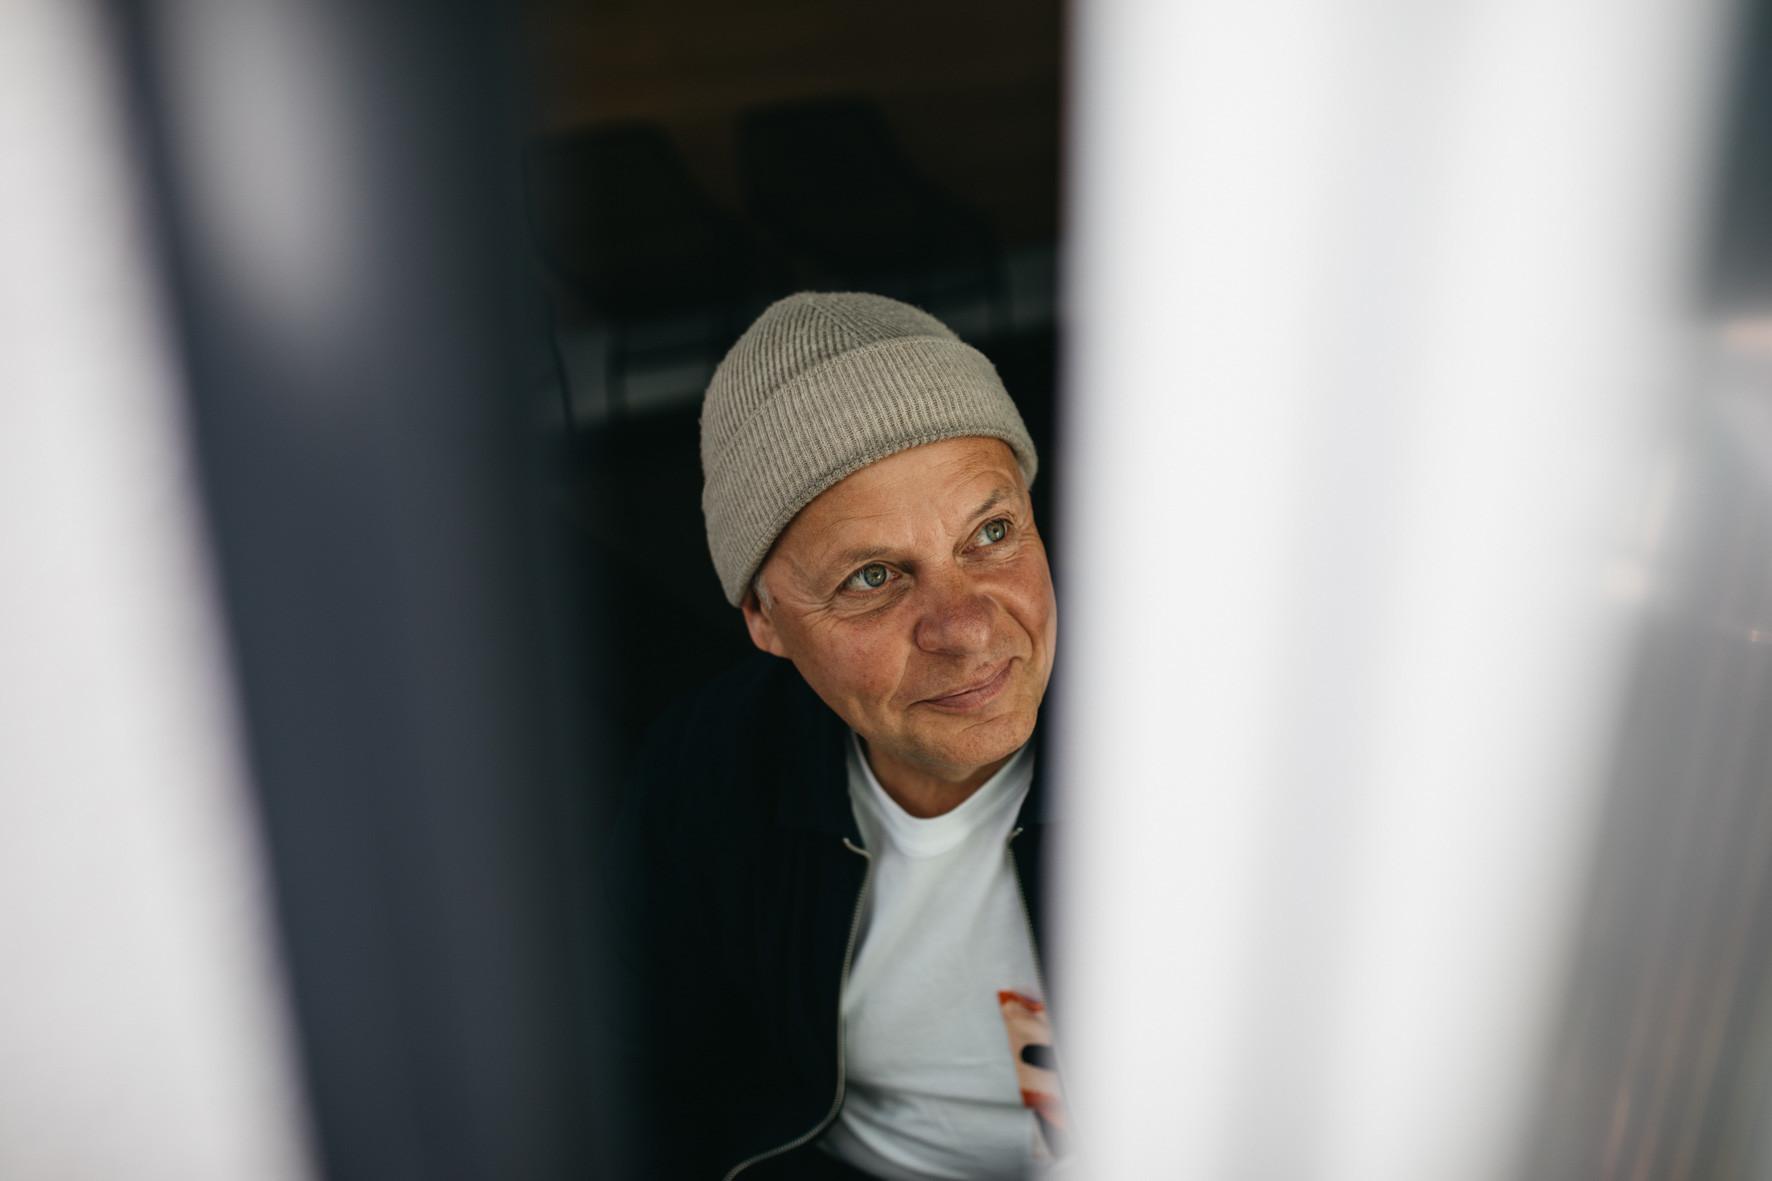 Juha Harjula